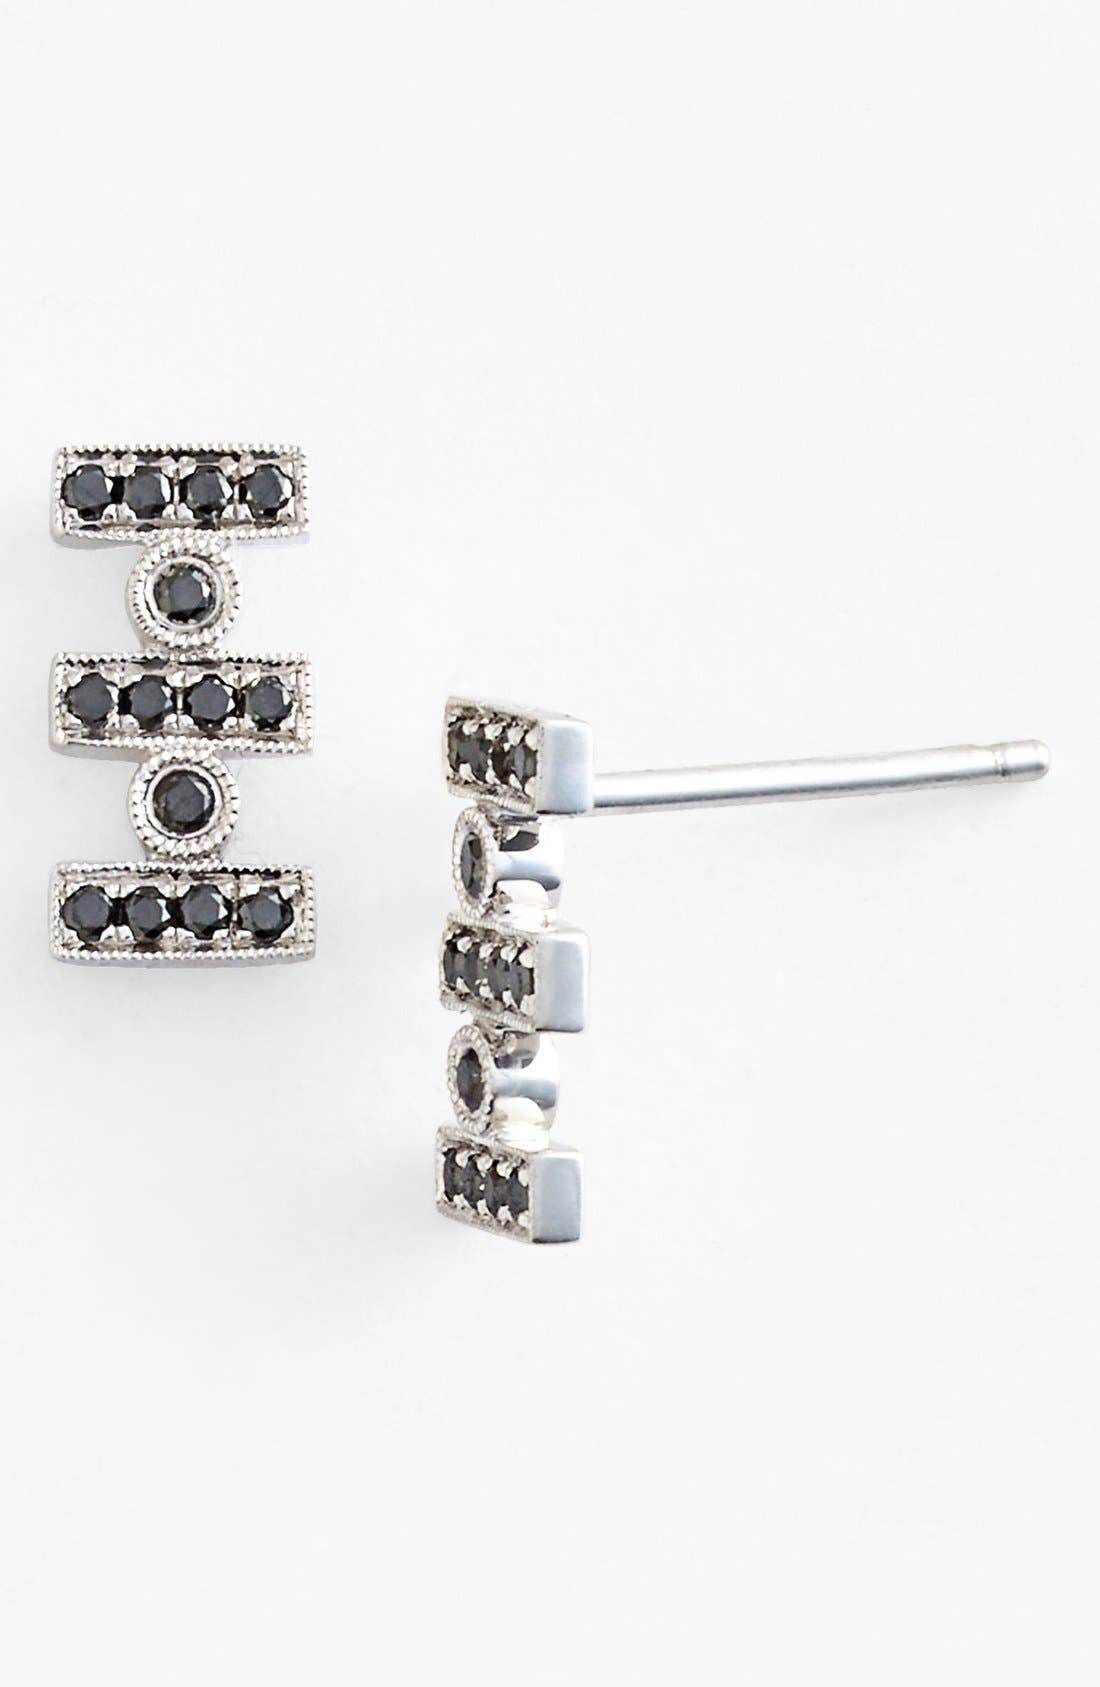 Main Image - Dana Rebecca Designs 'Reese' Diamond Stud Earrings